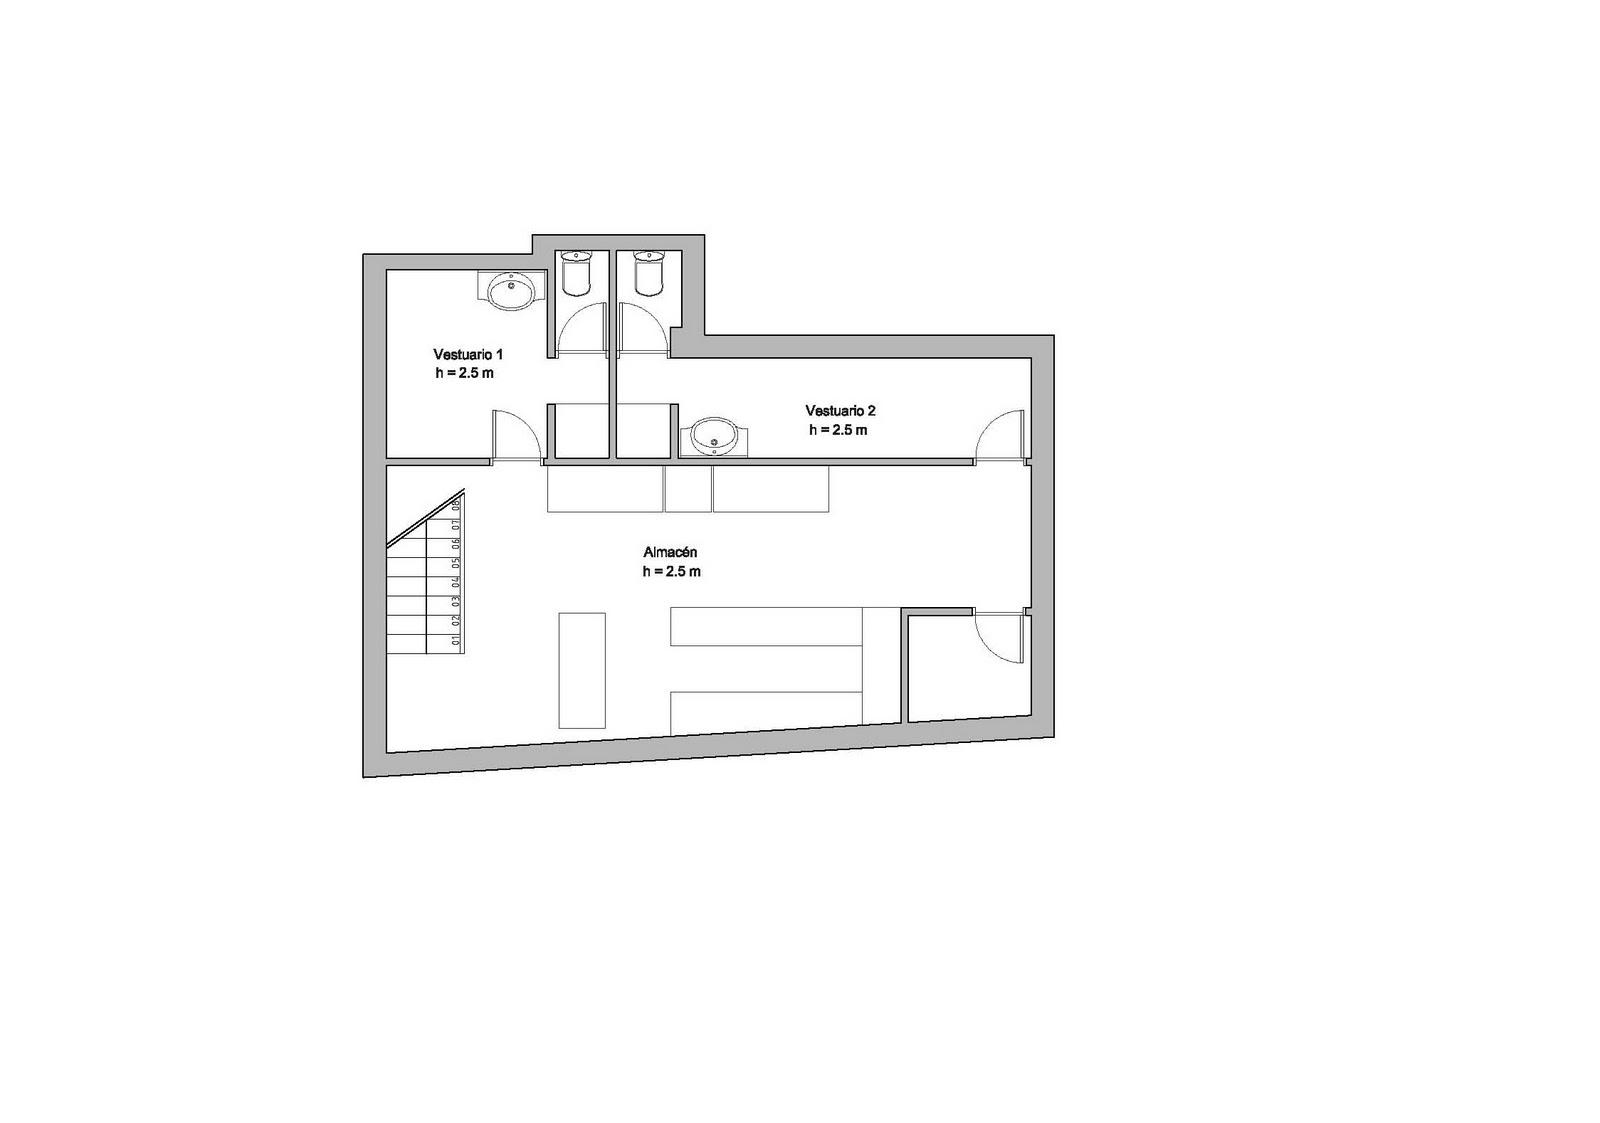 Arquitectira for Plano restaurante